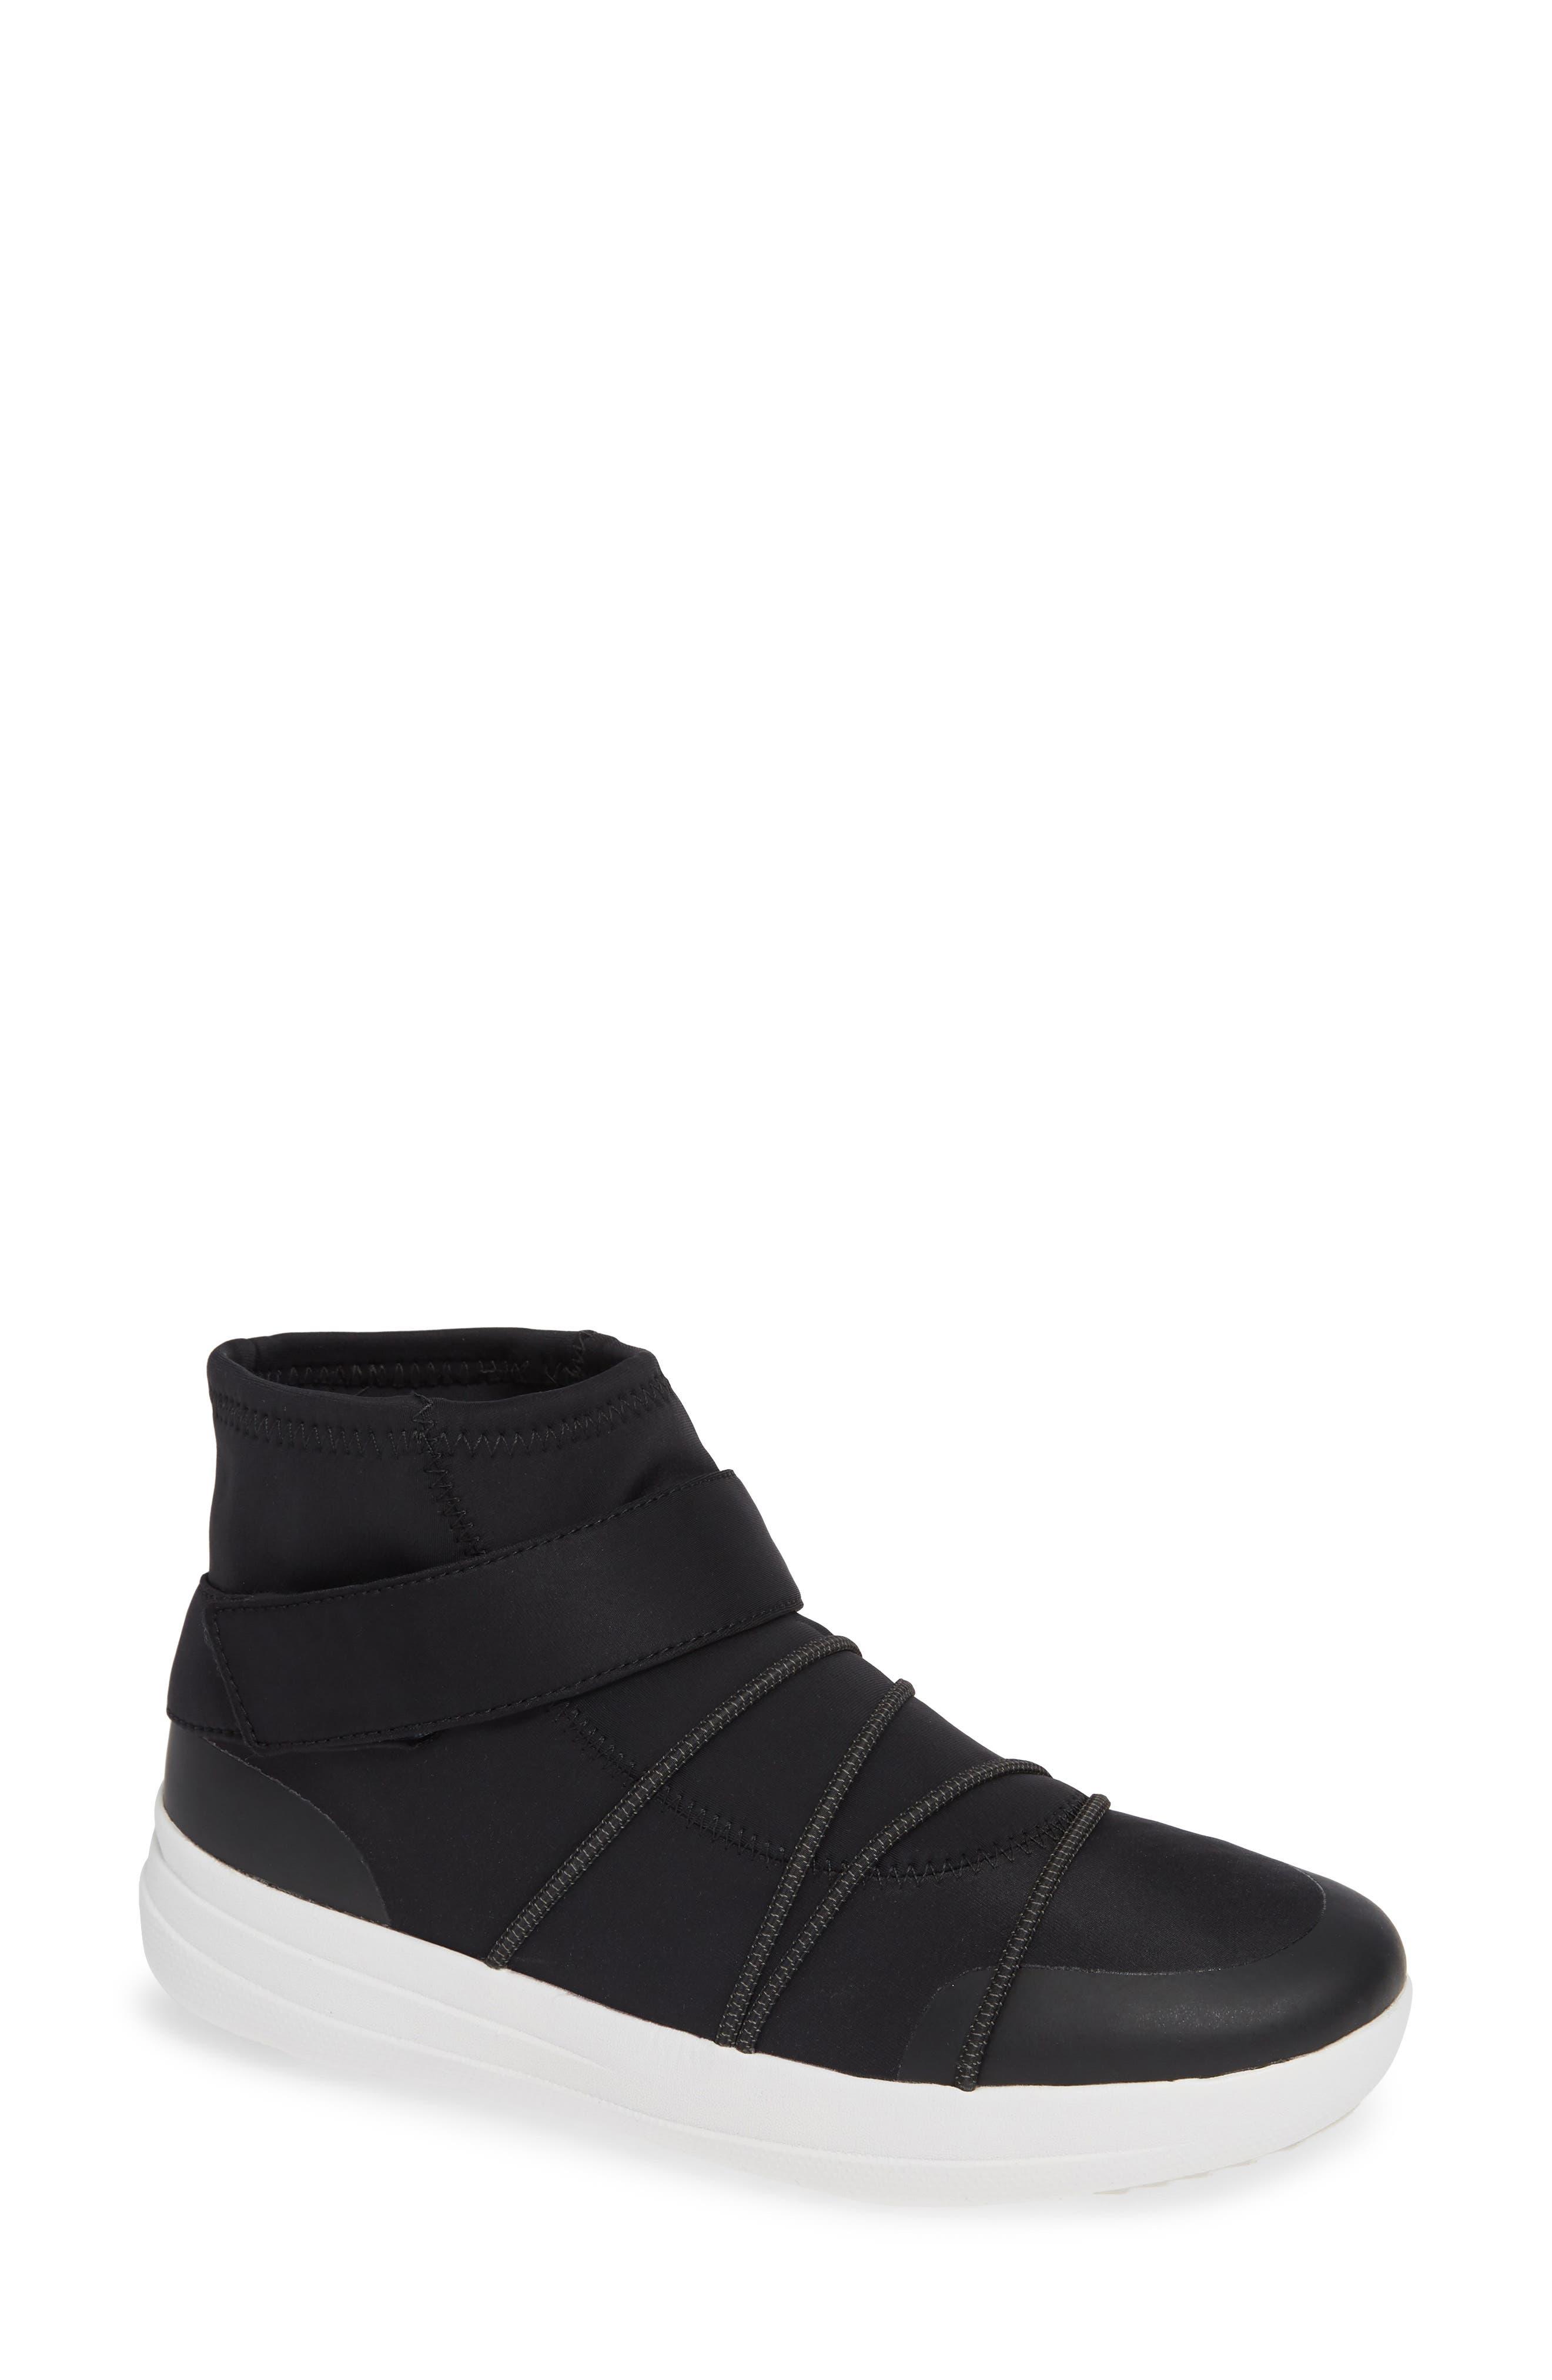 Neoflex High Top Sneaker,                             Main thumbnail 1, color,                             BLACK FABRIC